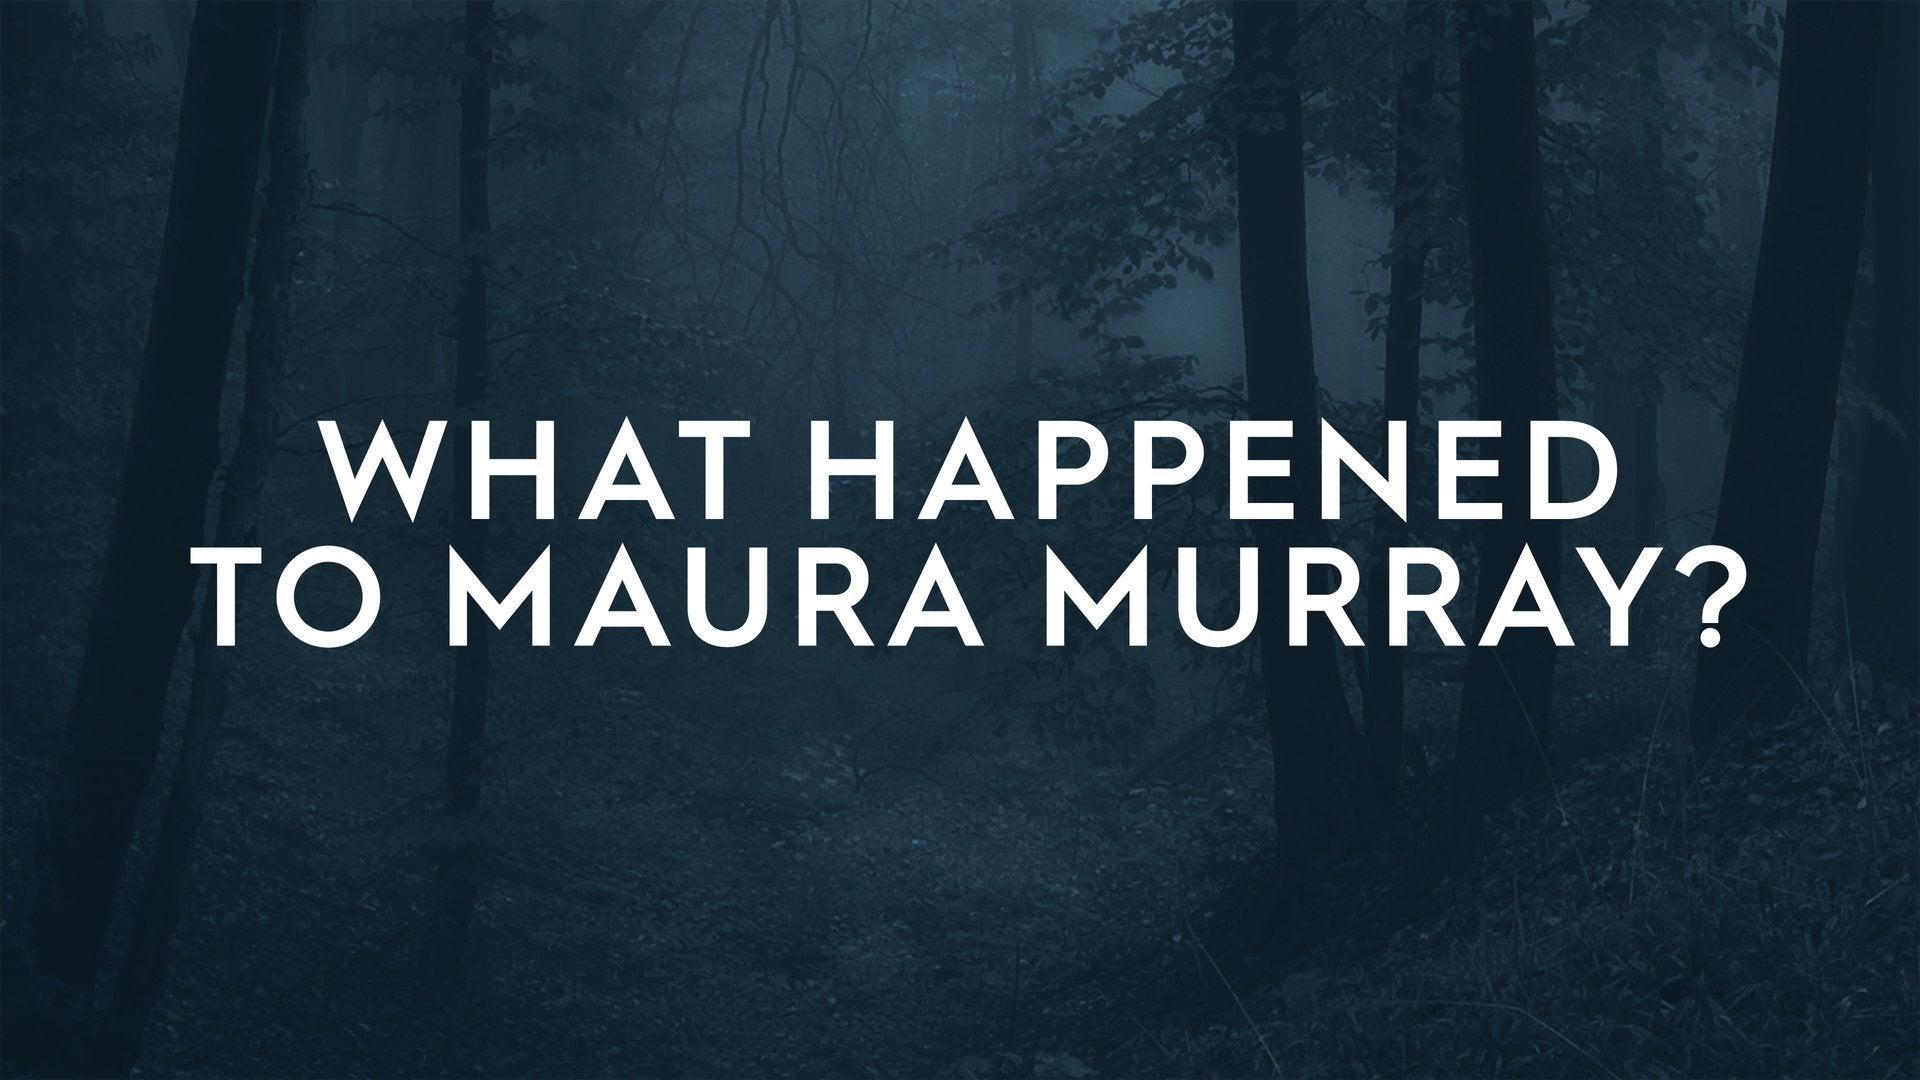 What Happened to Maura Murray?